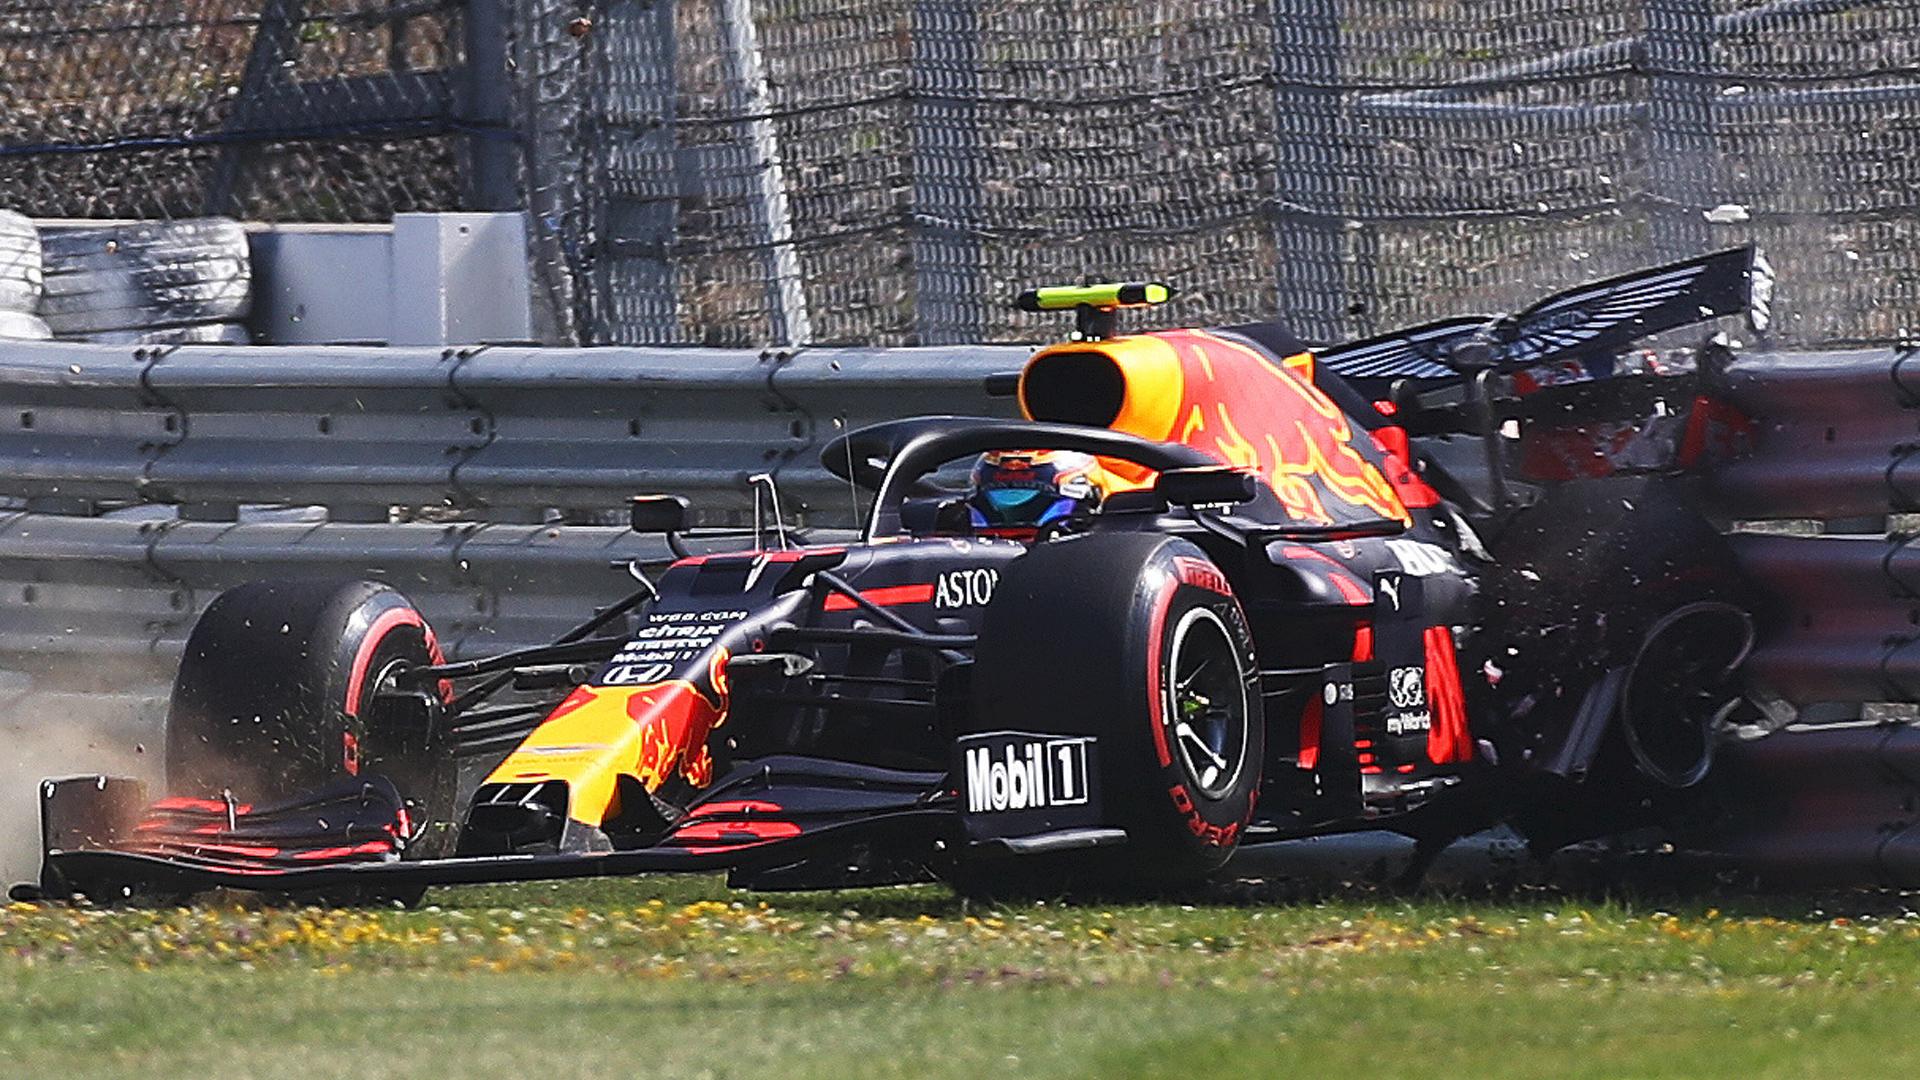 FP2 Highlights: 2020 British Grand Prix